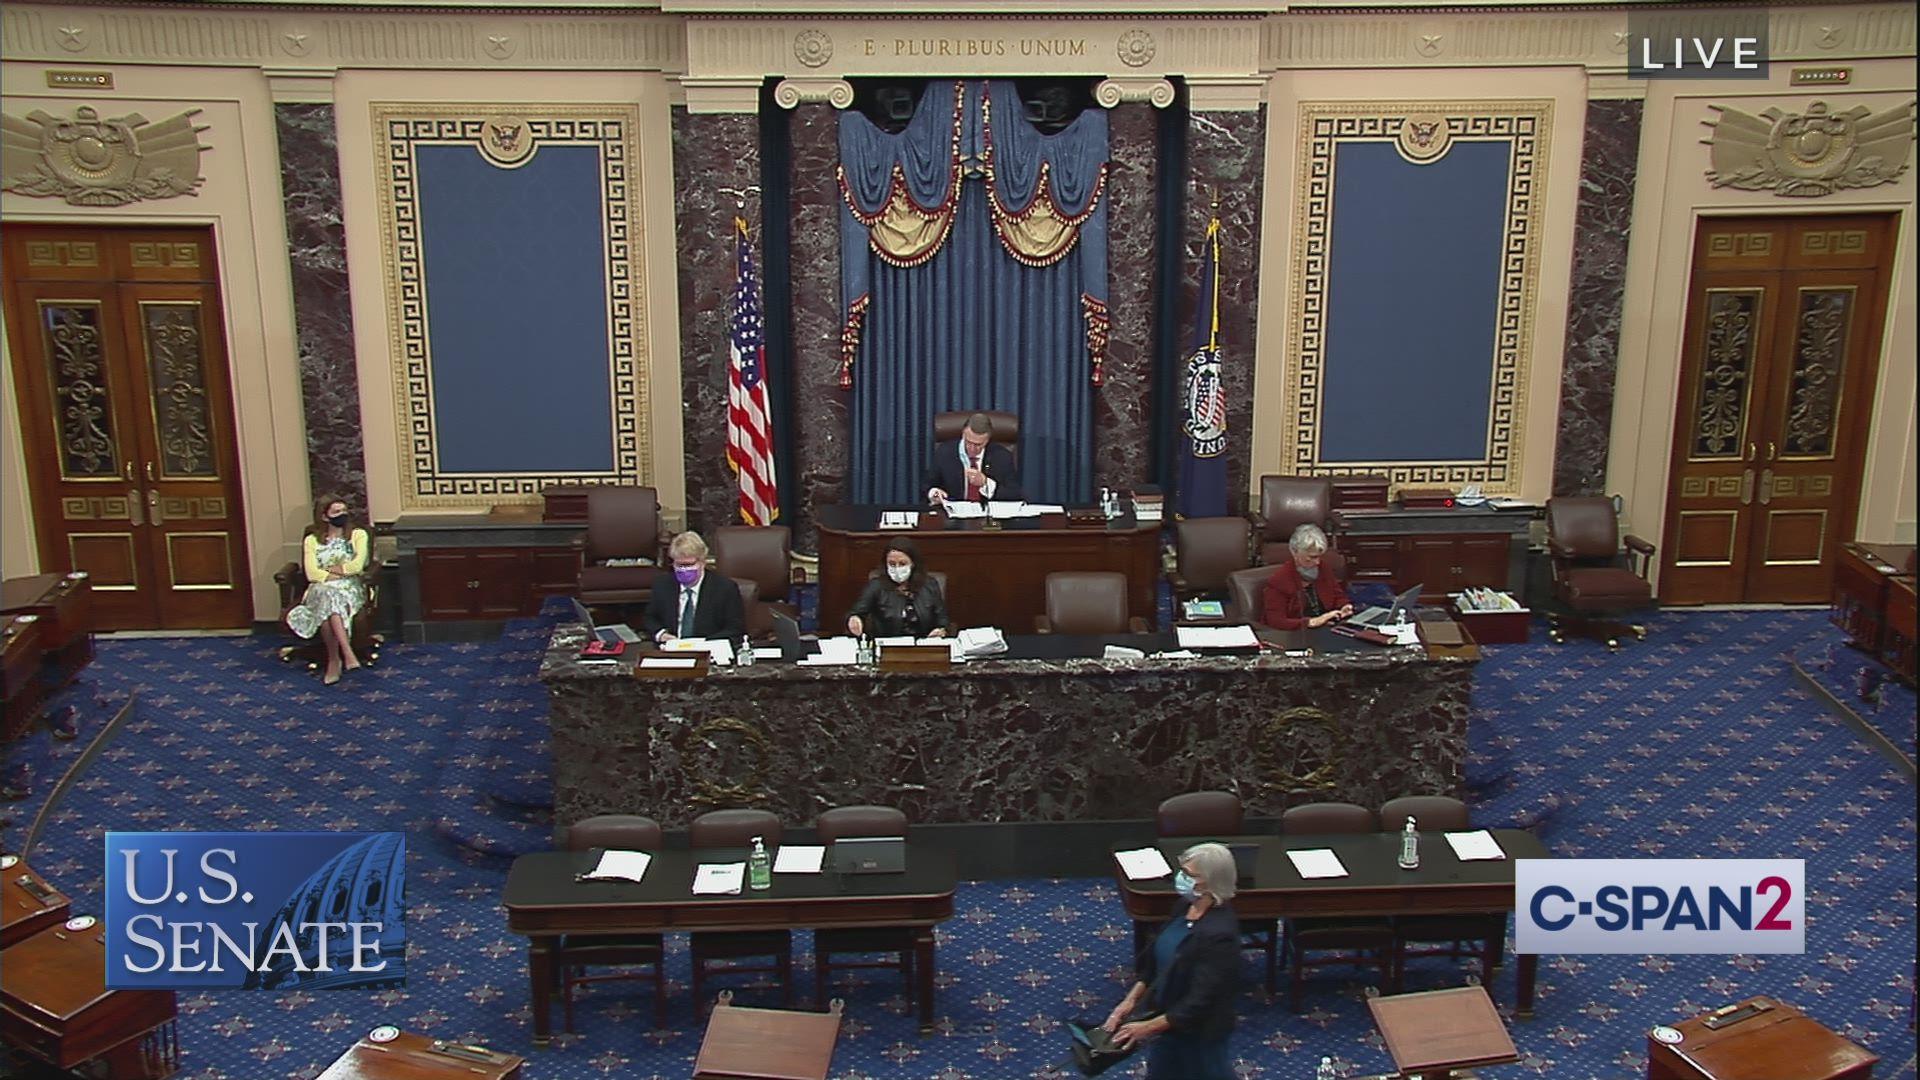 Senate Session, Part 2 | C-SPAN.org